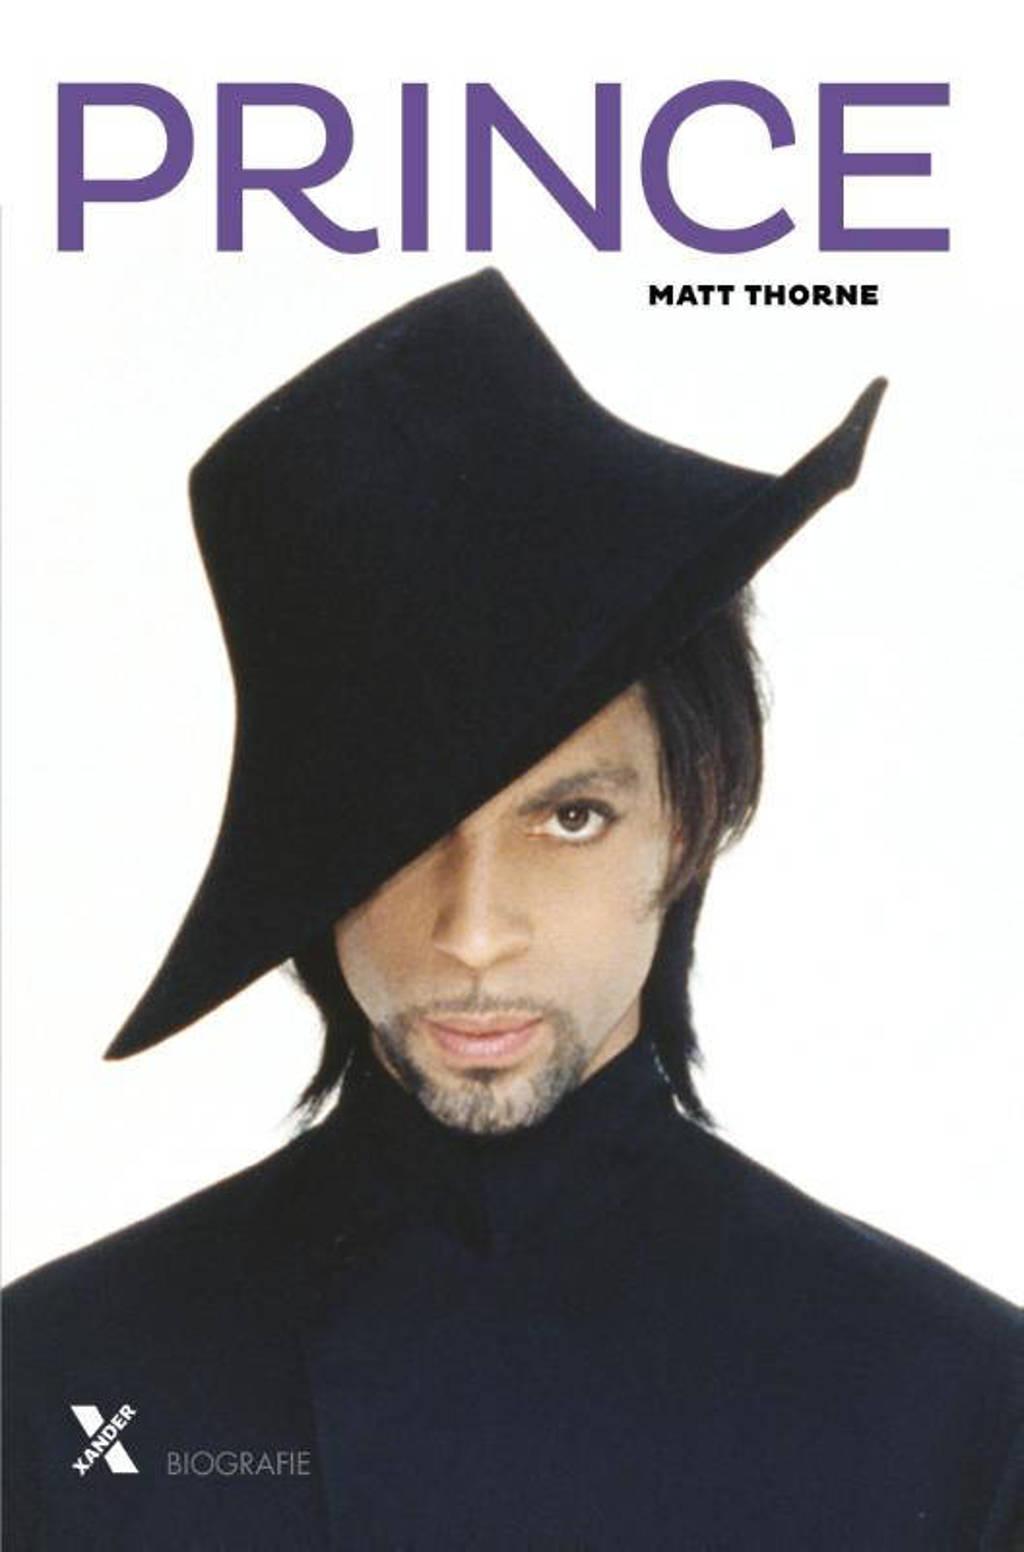 Prince - Matt Thorne